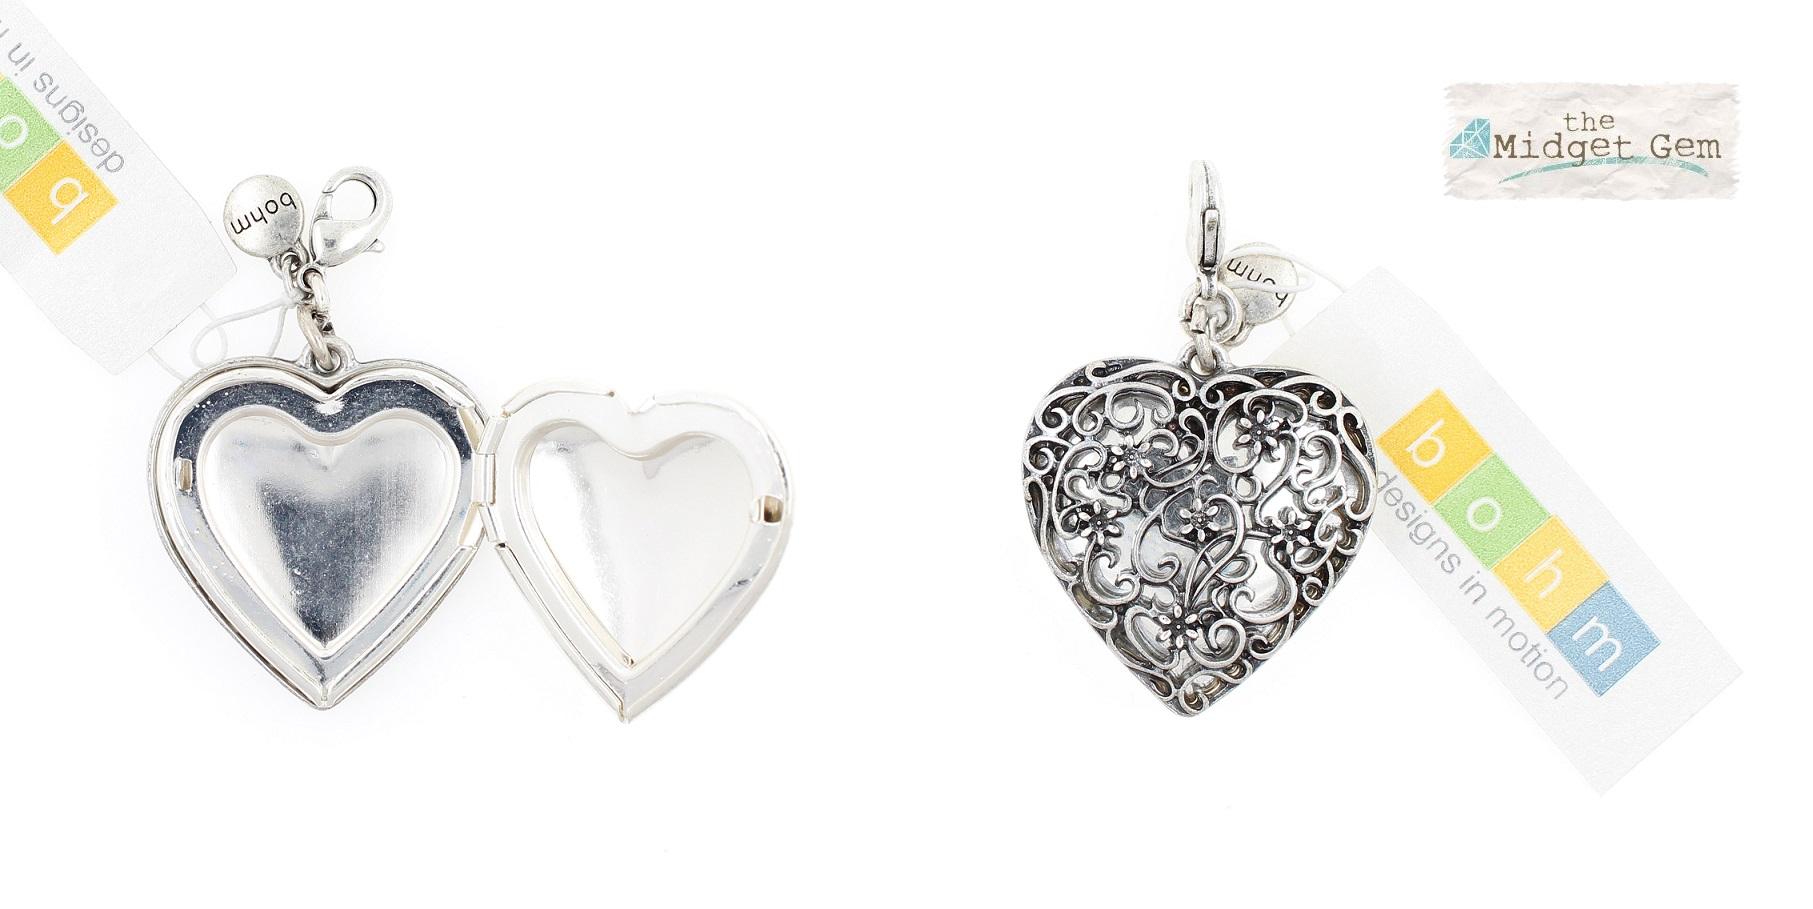 The Bohm - Summer Lovin' - 3 cm Heart Locket - Silver Plate BNWT